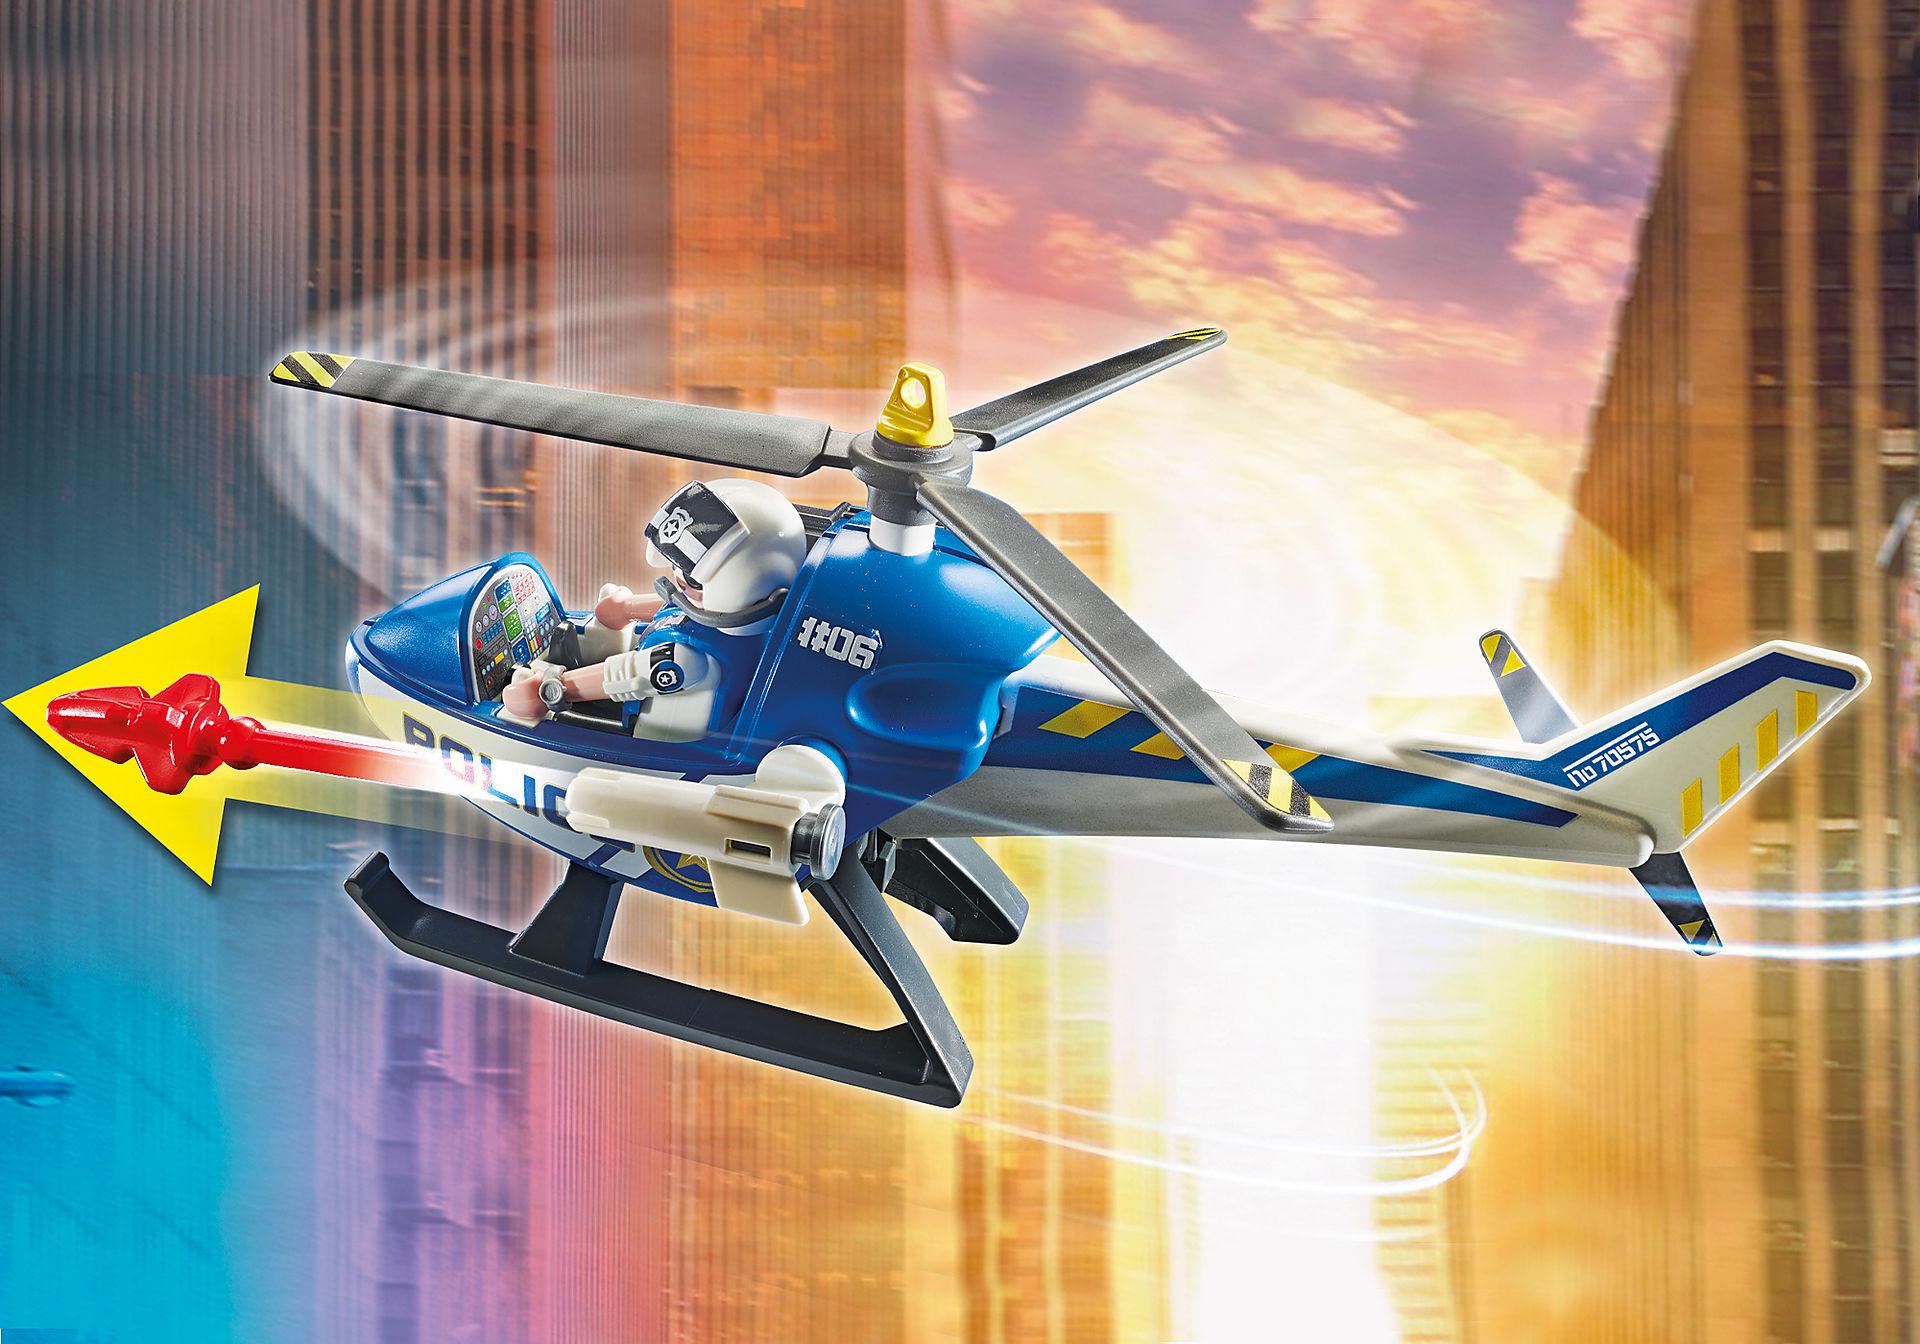 70575 Polizei-Helikopter: Verfolgung des Fluchtfahrzeugs zoom image5